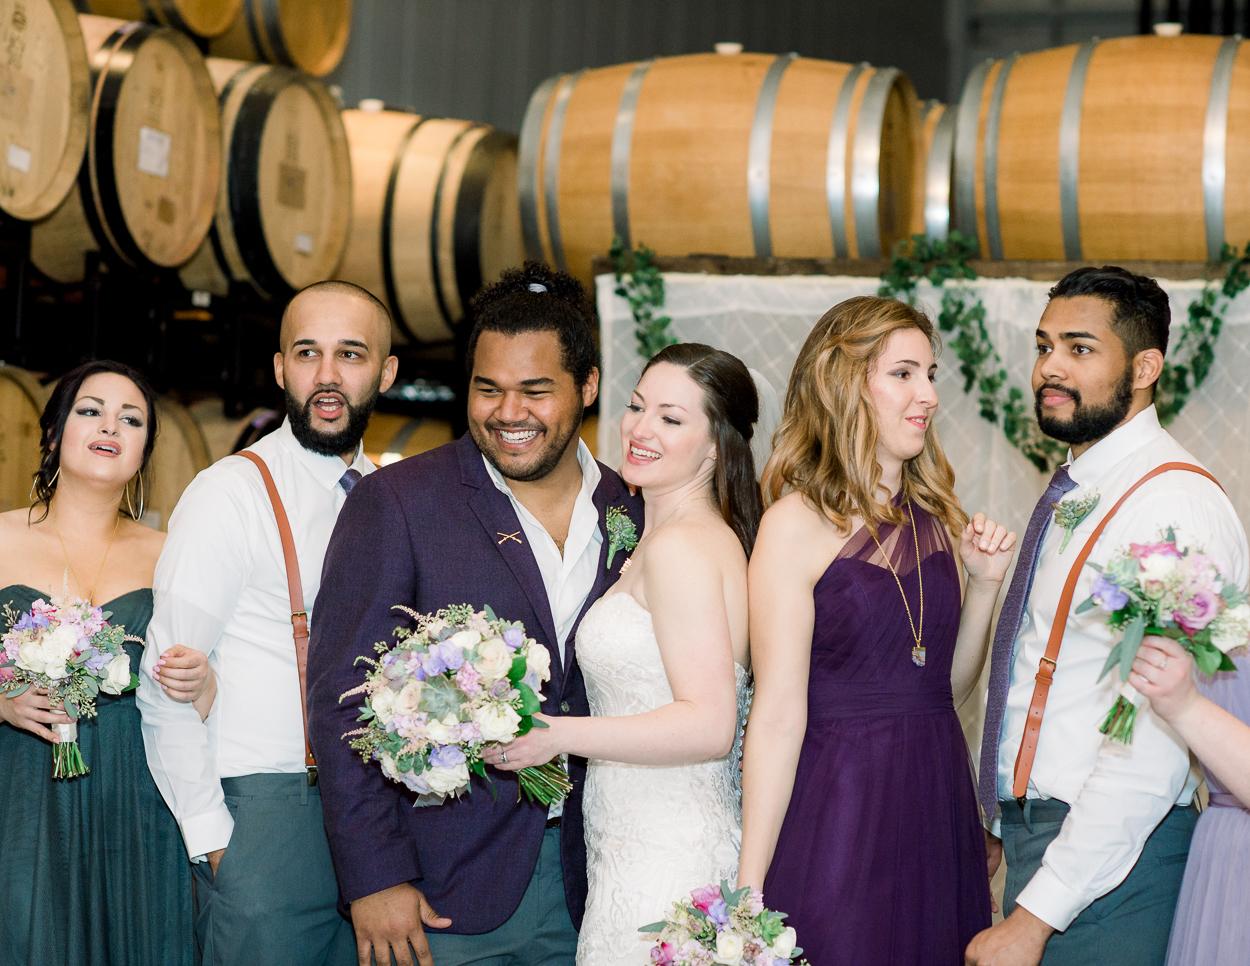 BigCork_vineyard wedding_virginiaweddingphotographer_youseephotography_SarahJames (101).JPG